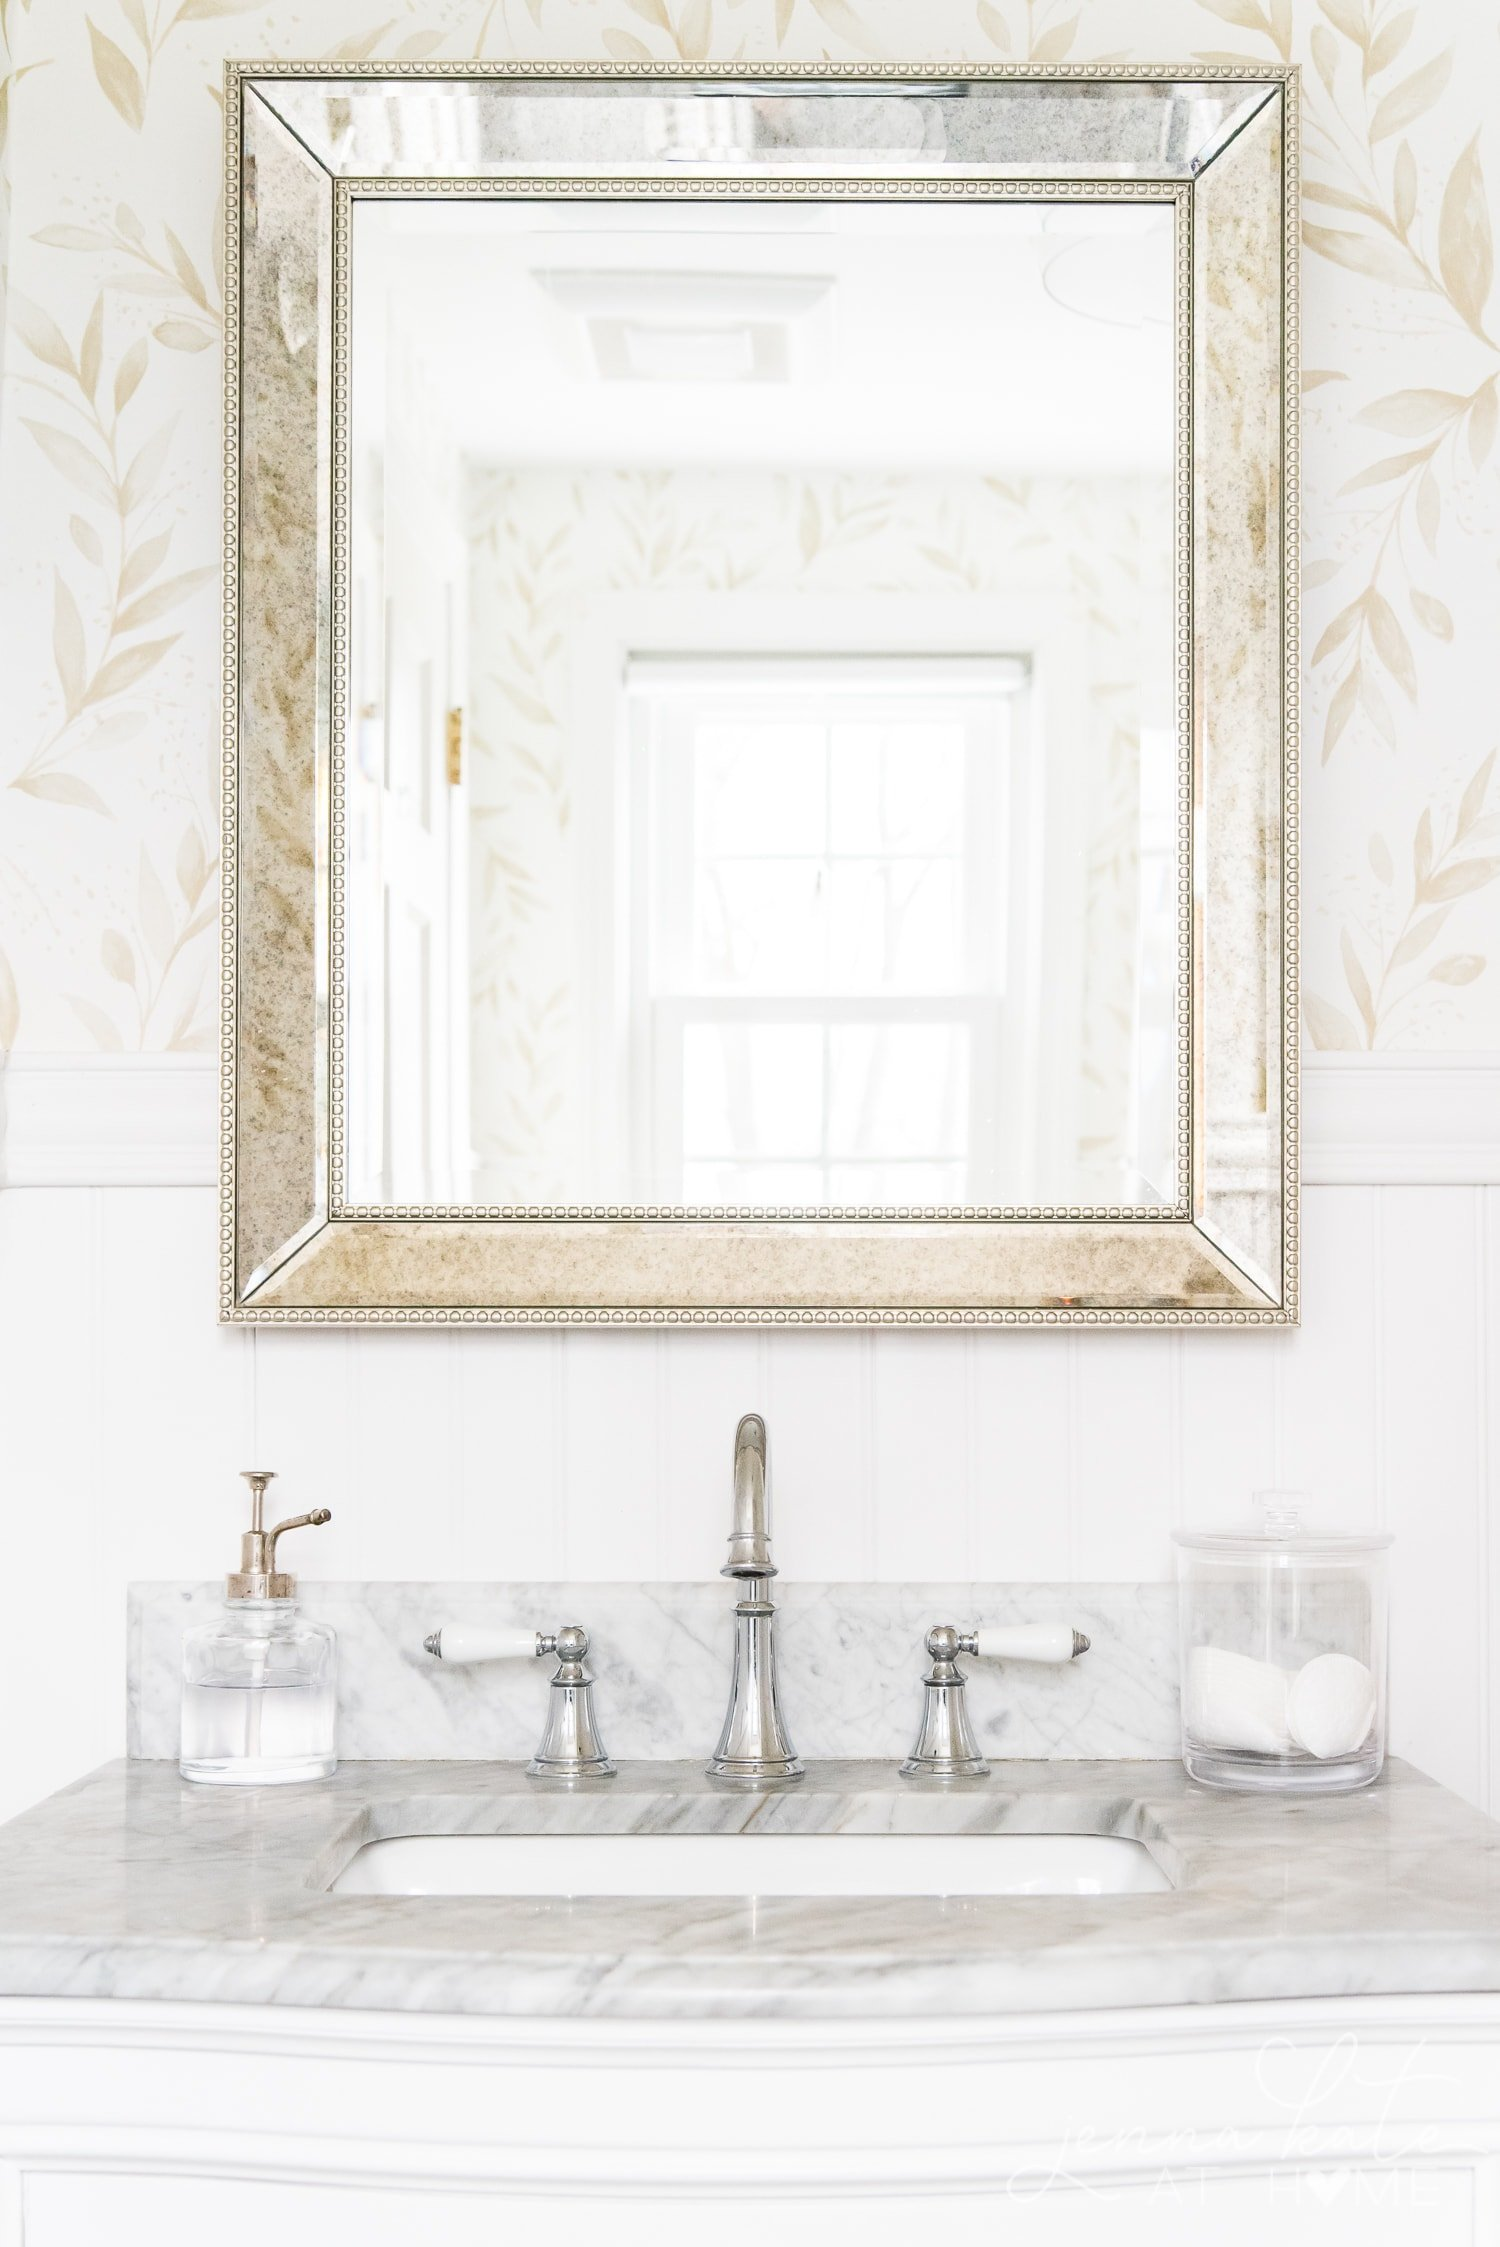 Mercury glass mirror reflecting beautiful floral wallpaper in bathroom